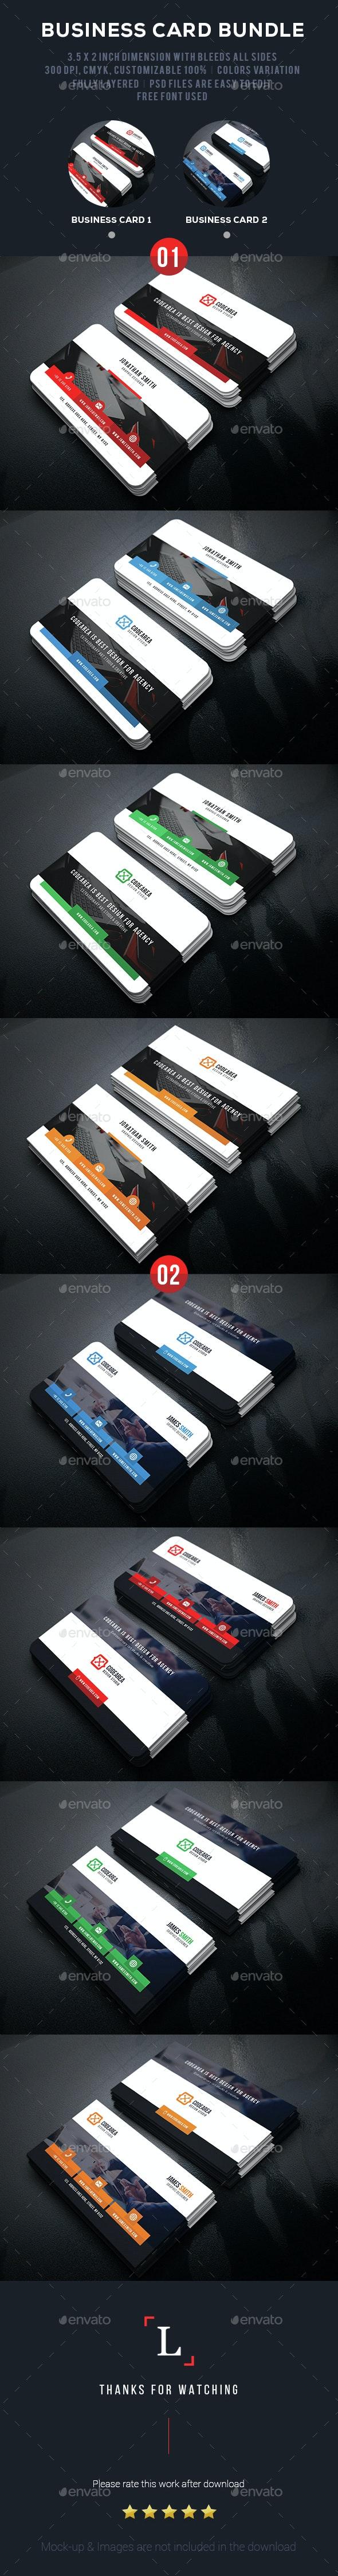 Corporate Business Card Bundle - Business Cards Print Templates